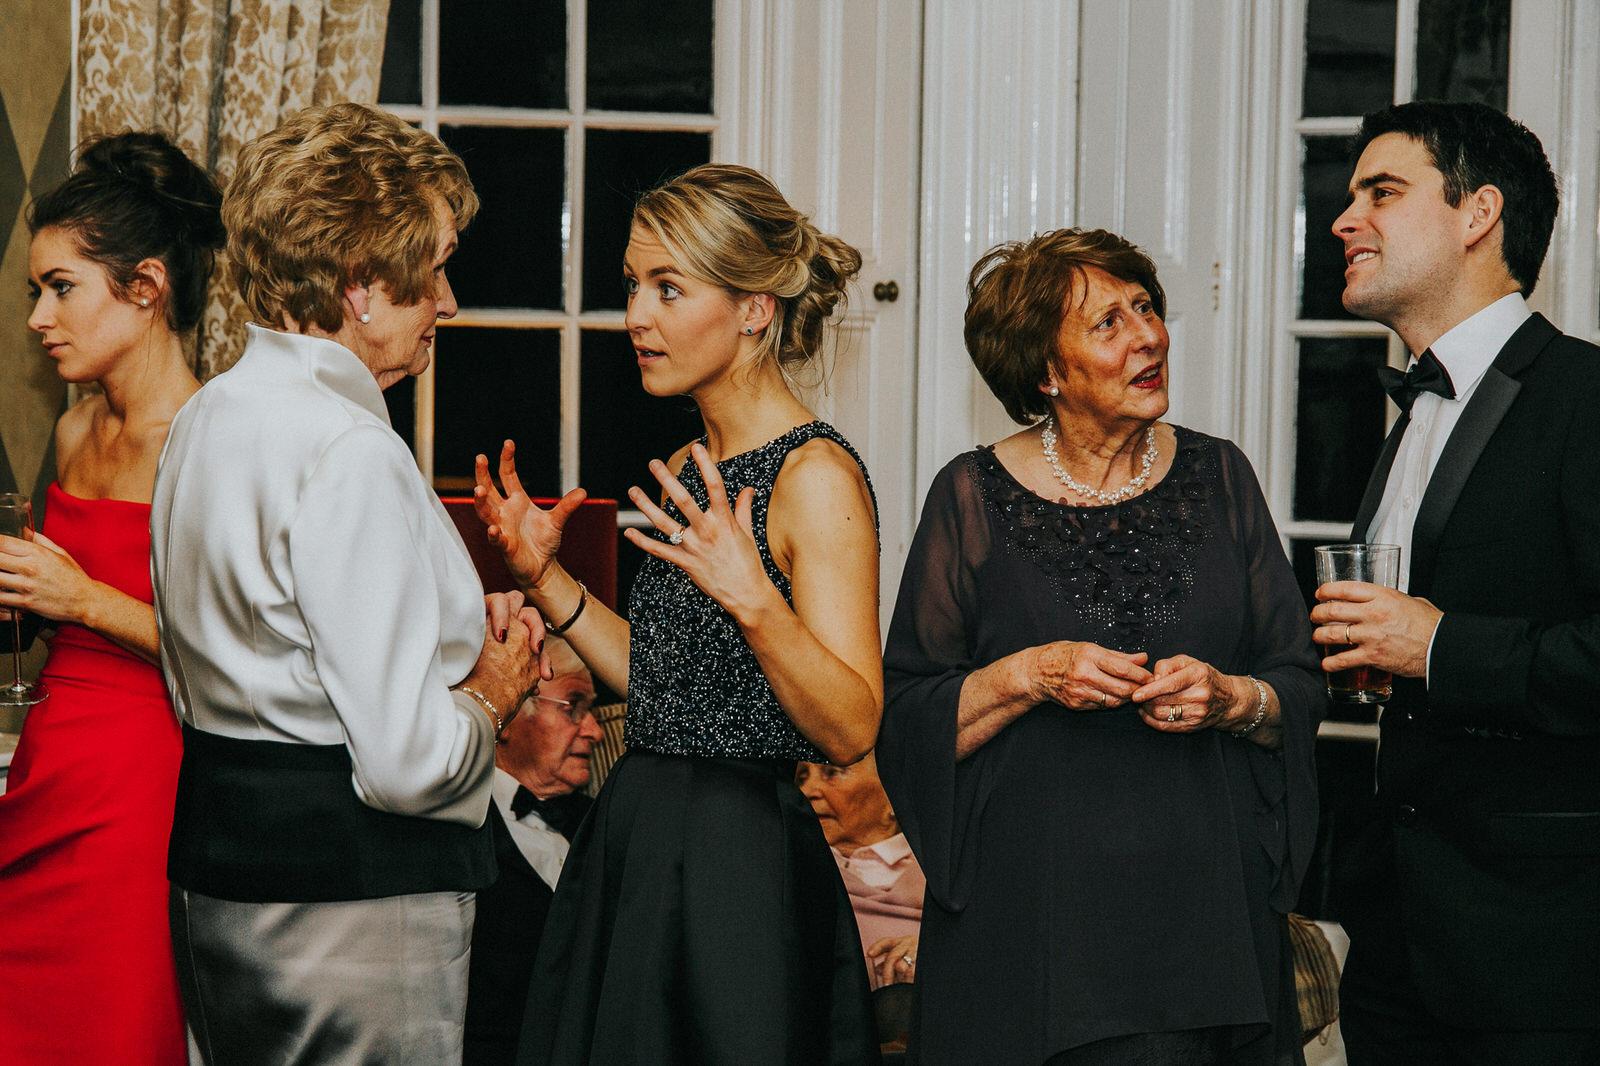 Dunbrody_House_Wedding_photographer_110.jpg